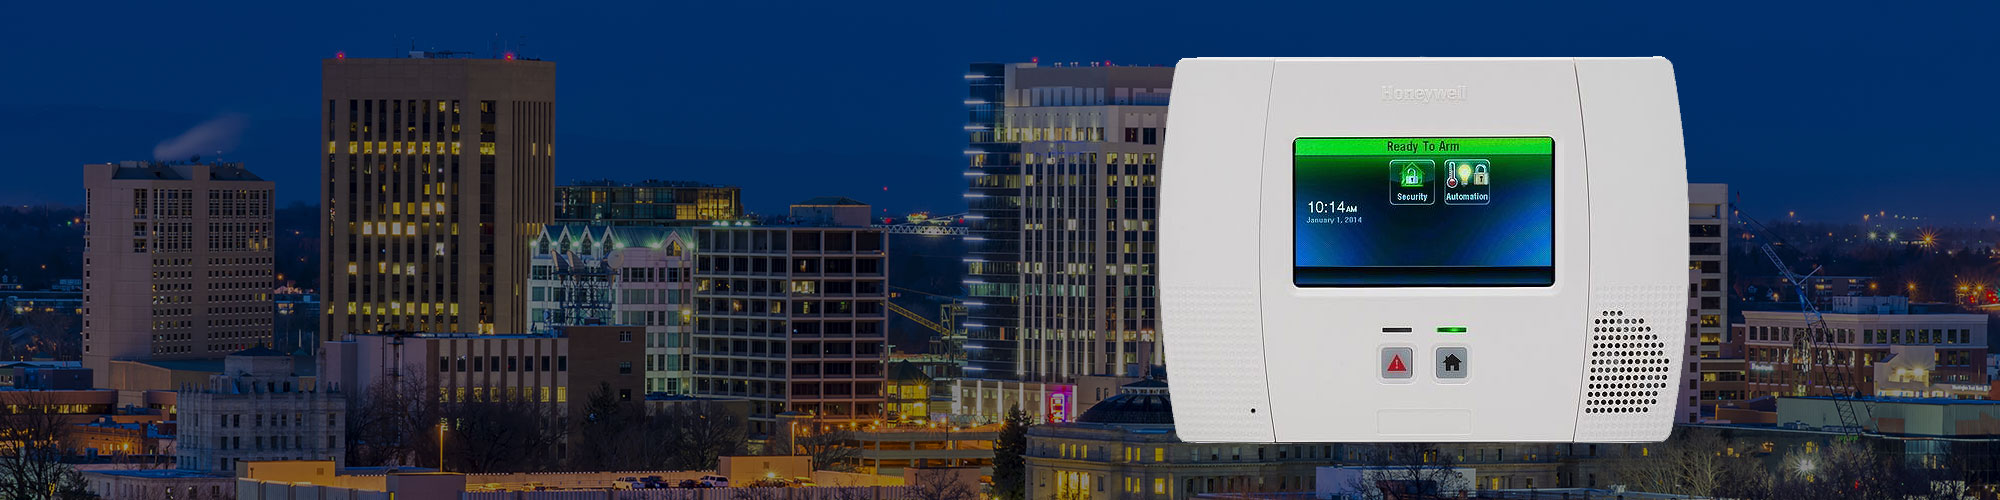 Crane Alarm Systems in Boise